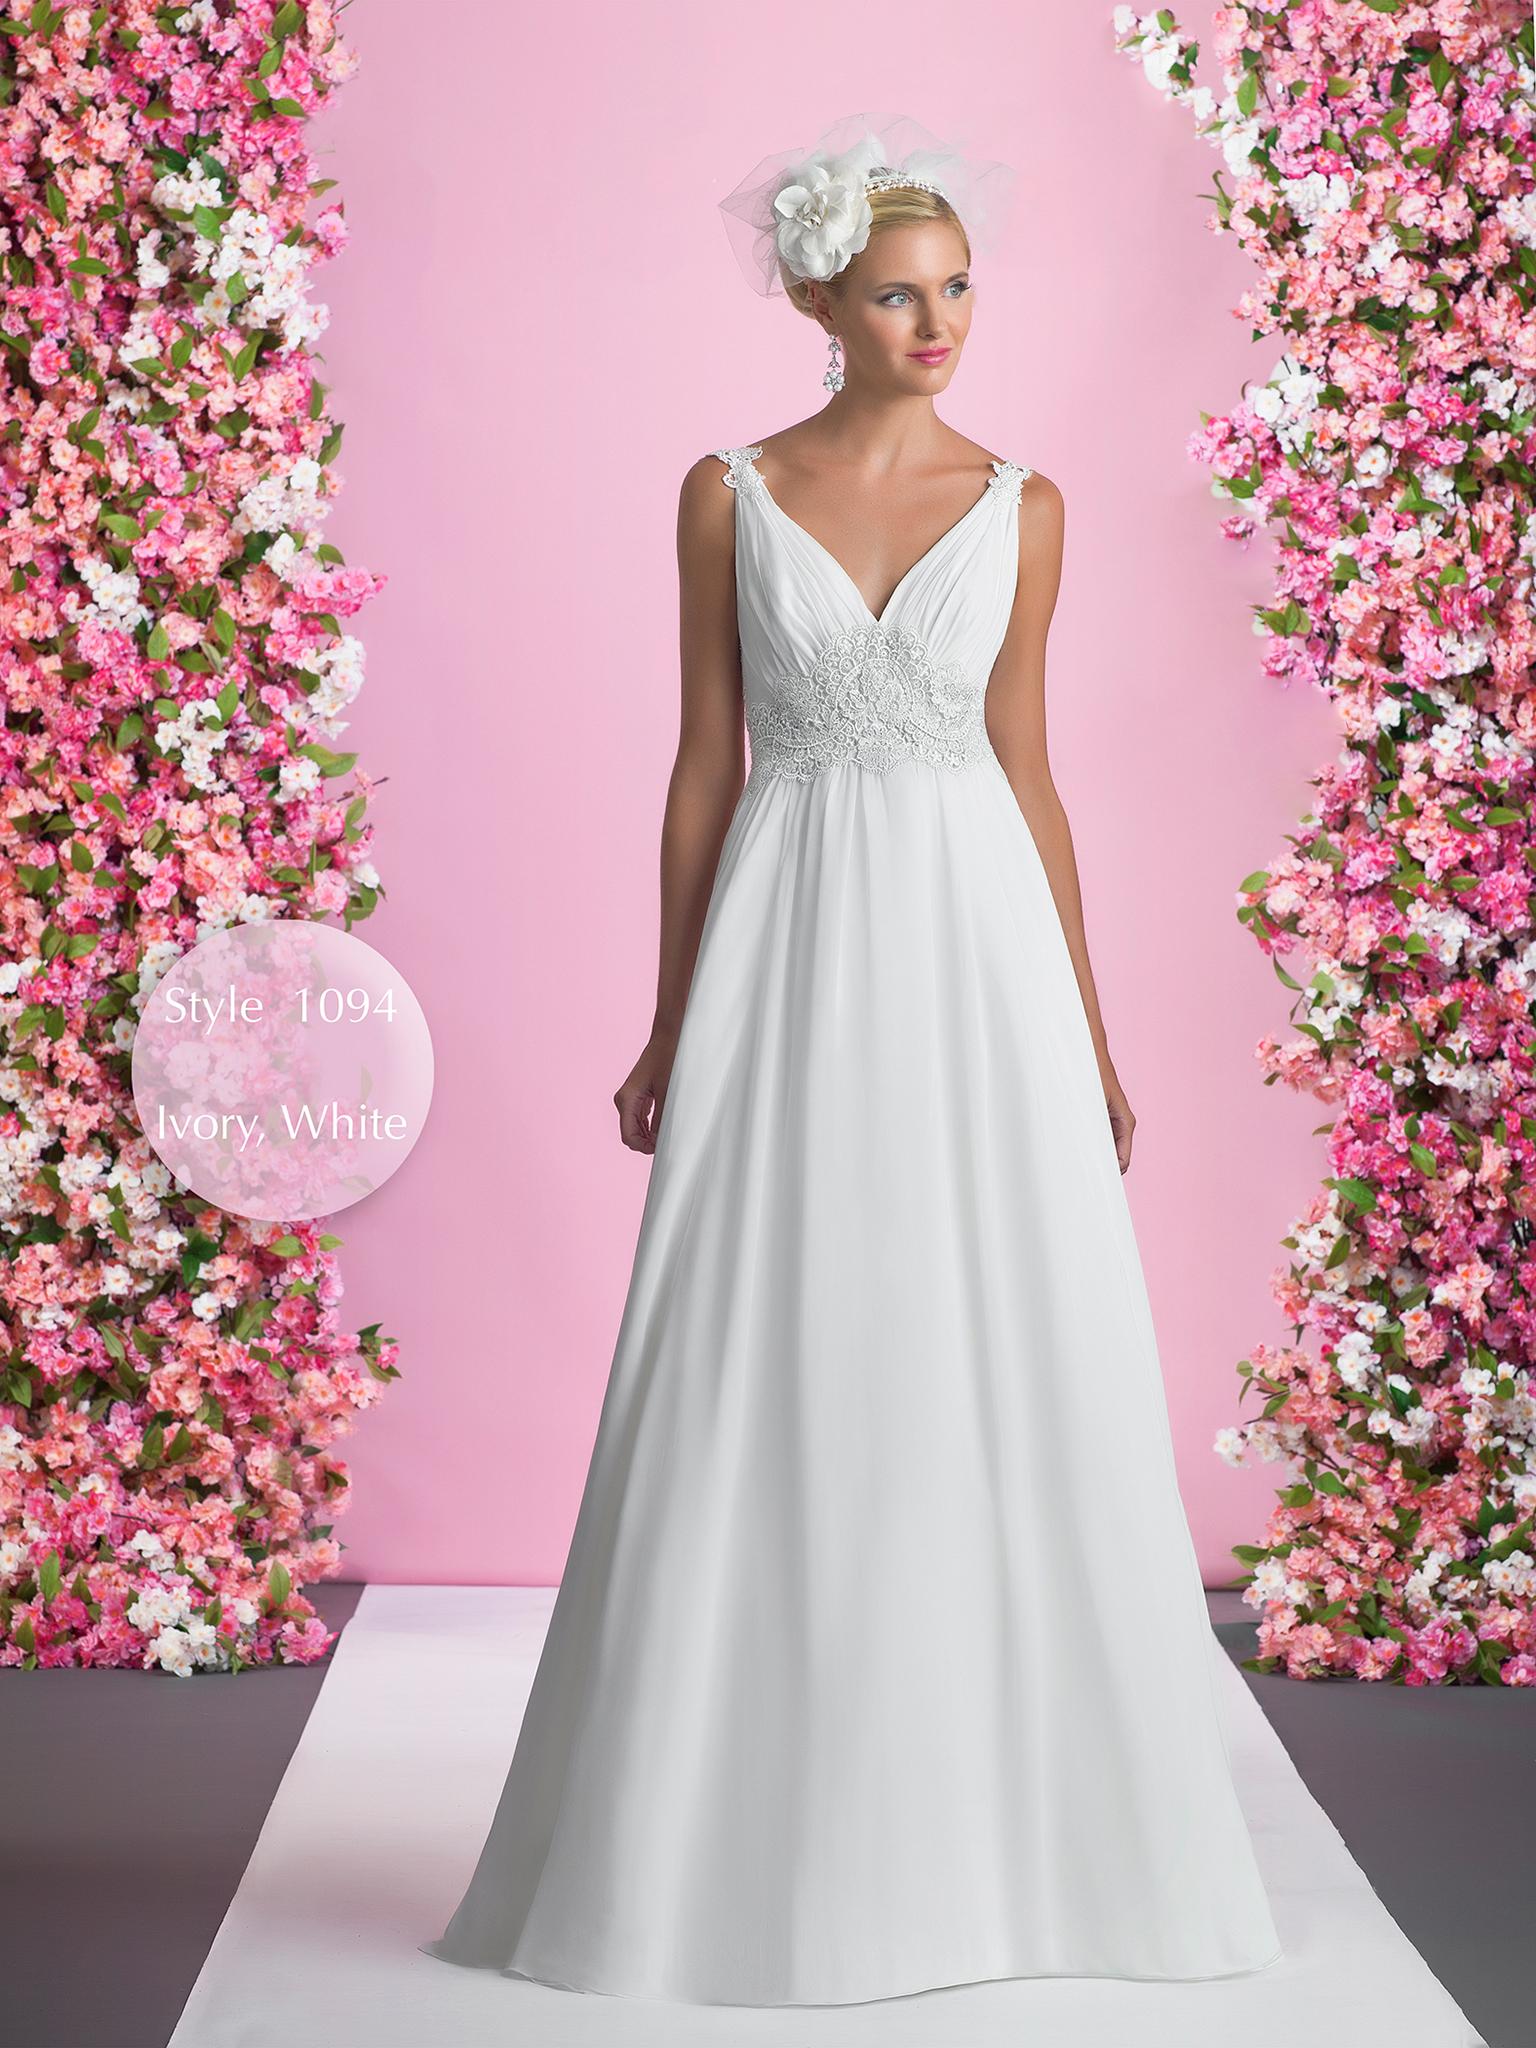 5 wedding dress styles for 5 different wedding destinations – Alexia ...